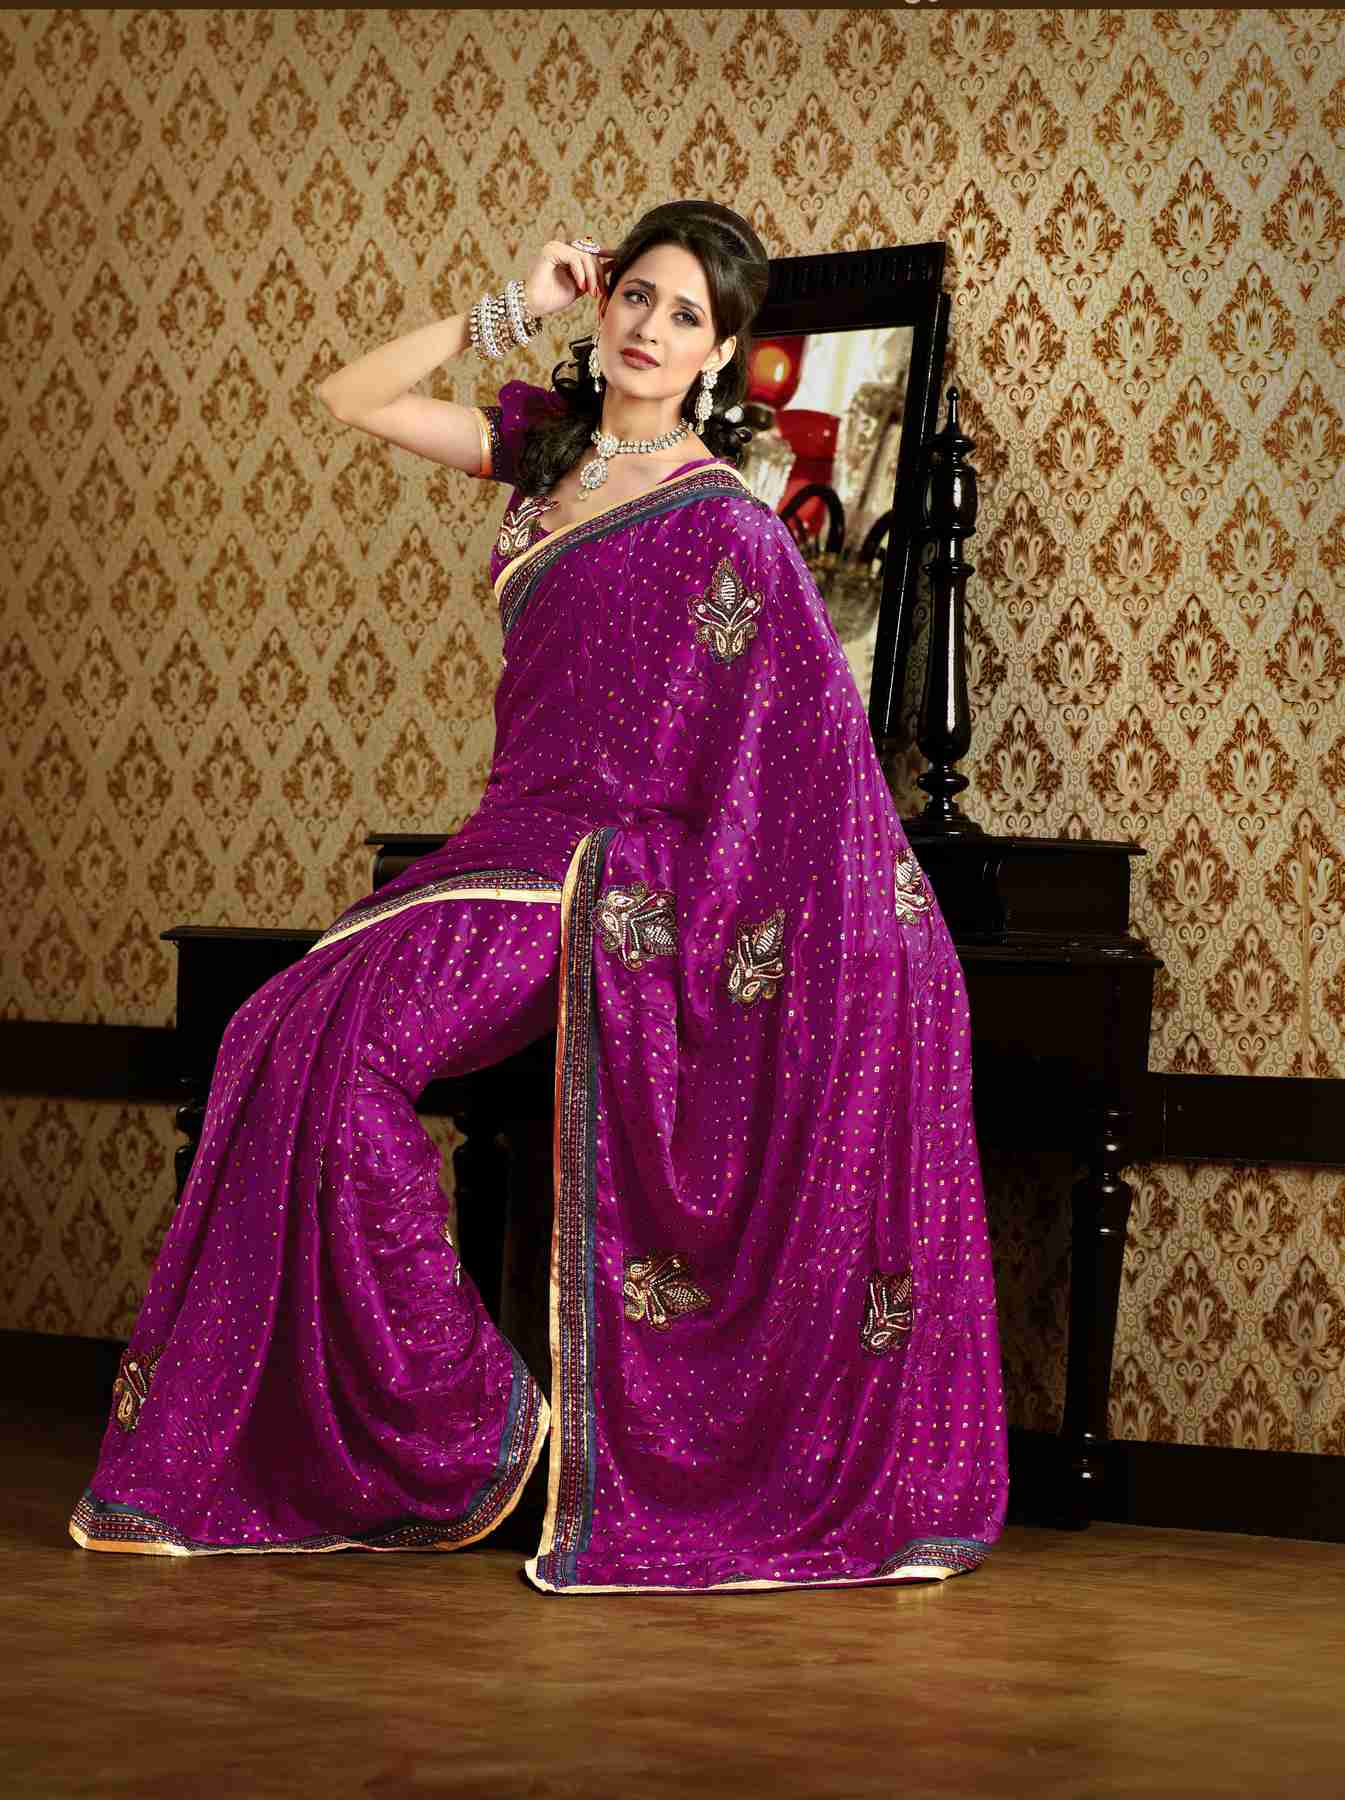 Darshana Deep Magenta Faux Crepe Luxury Party Wear Sari saree